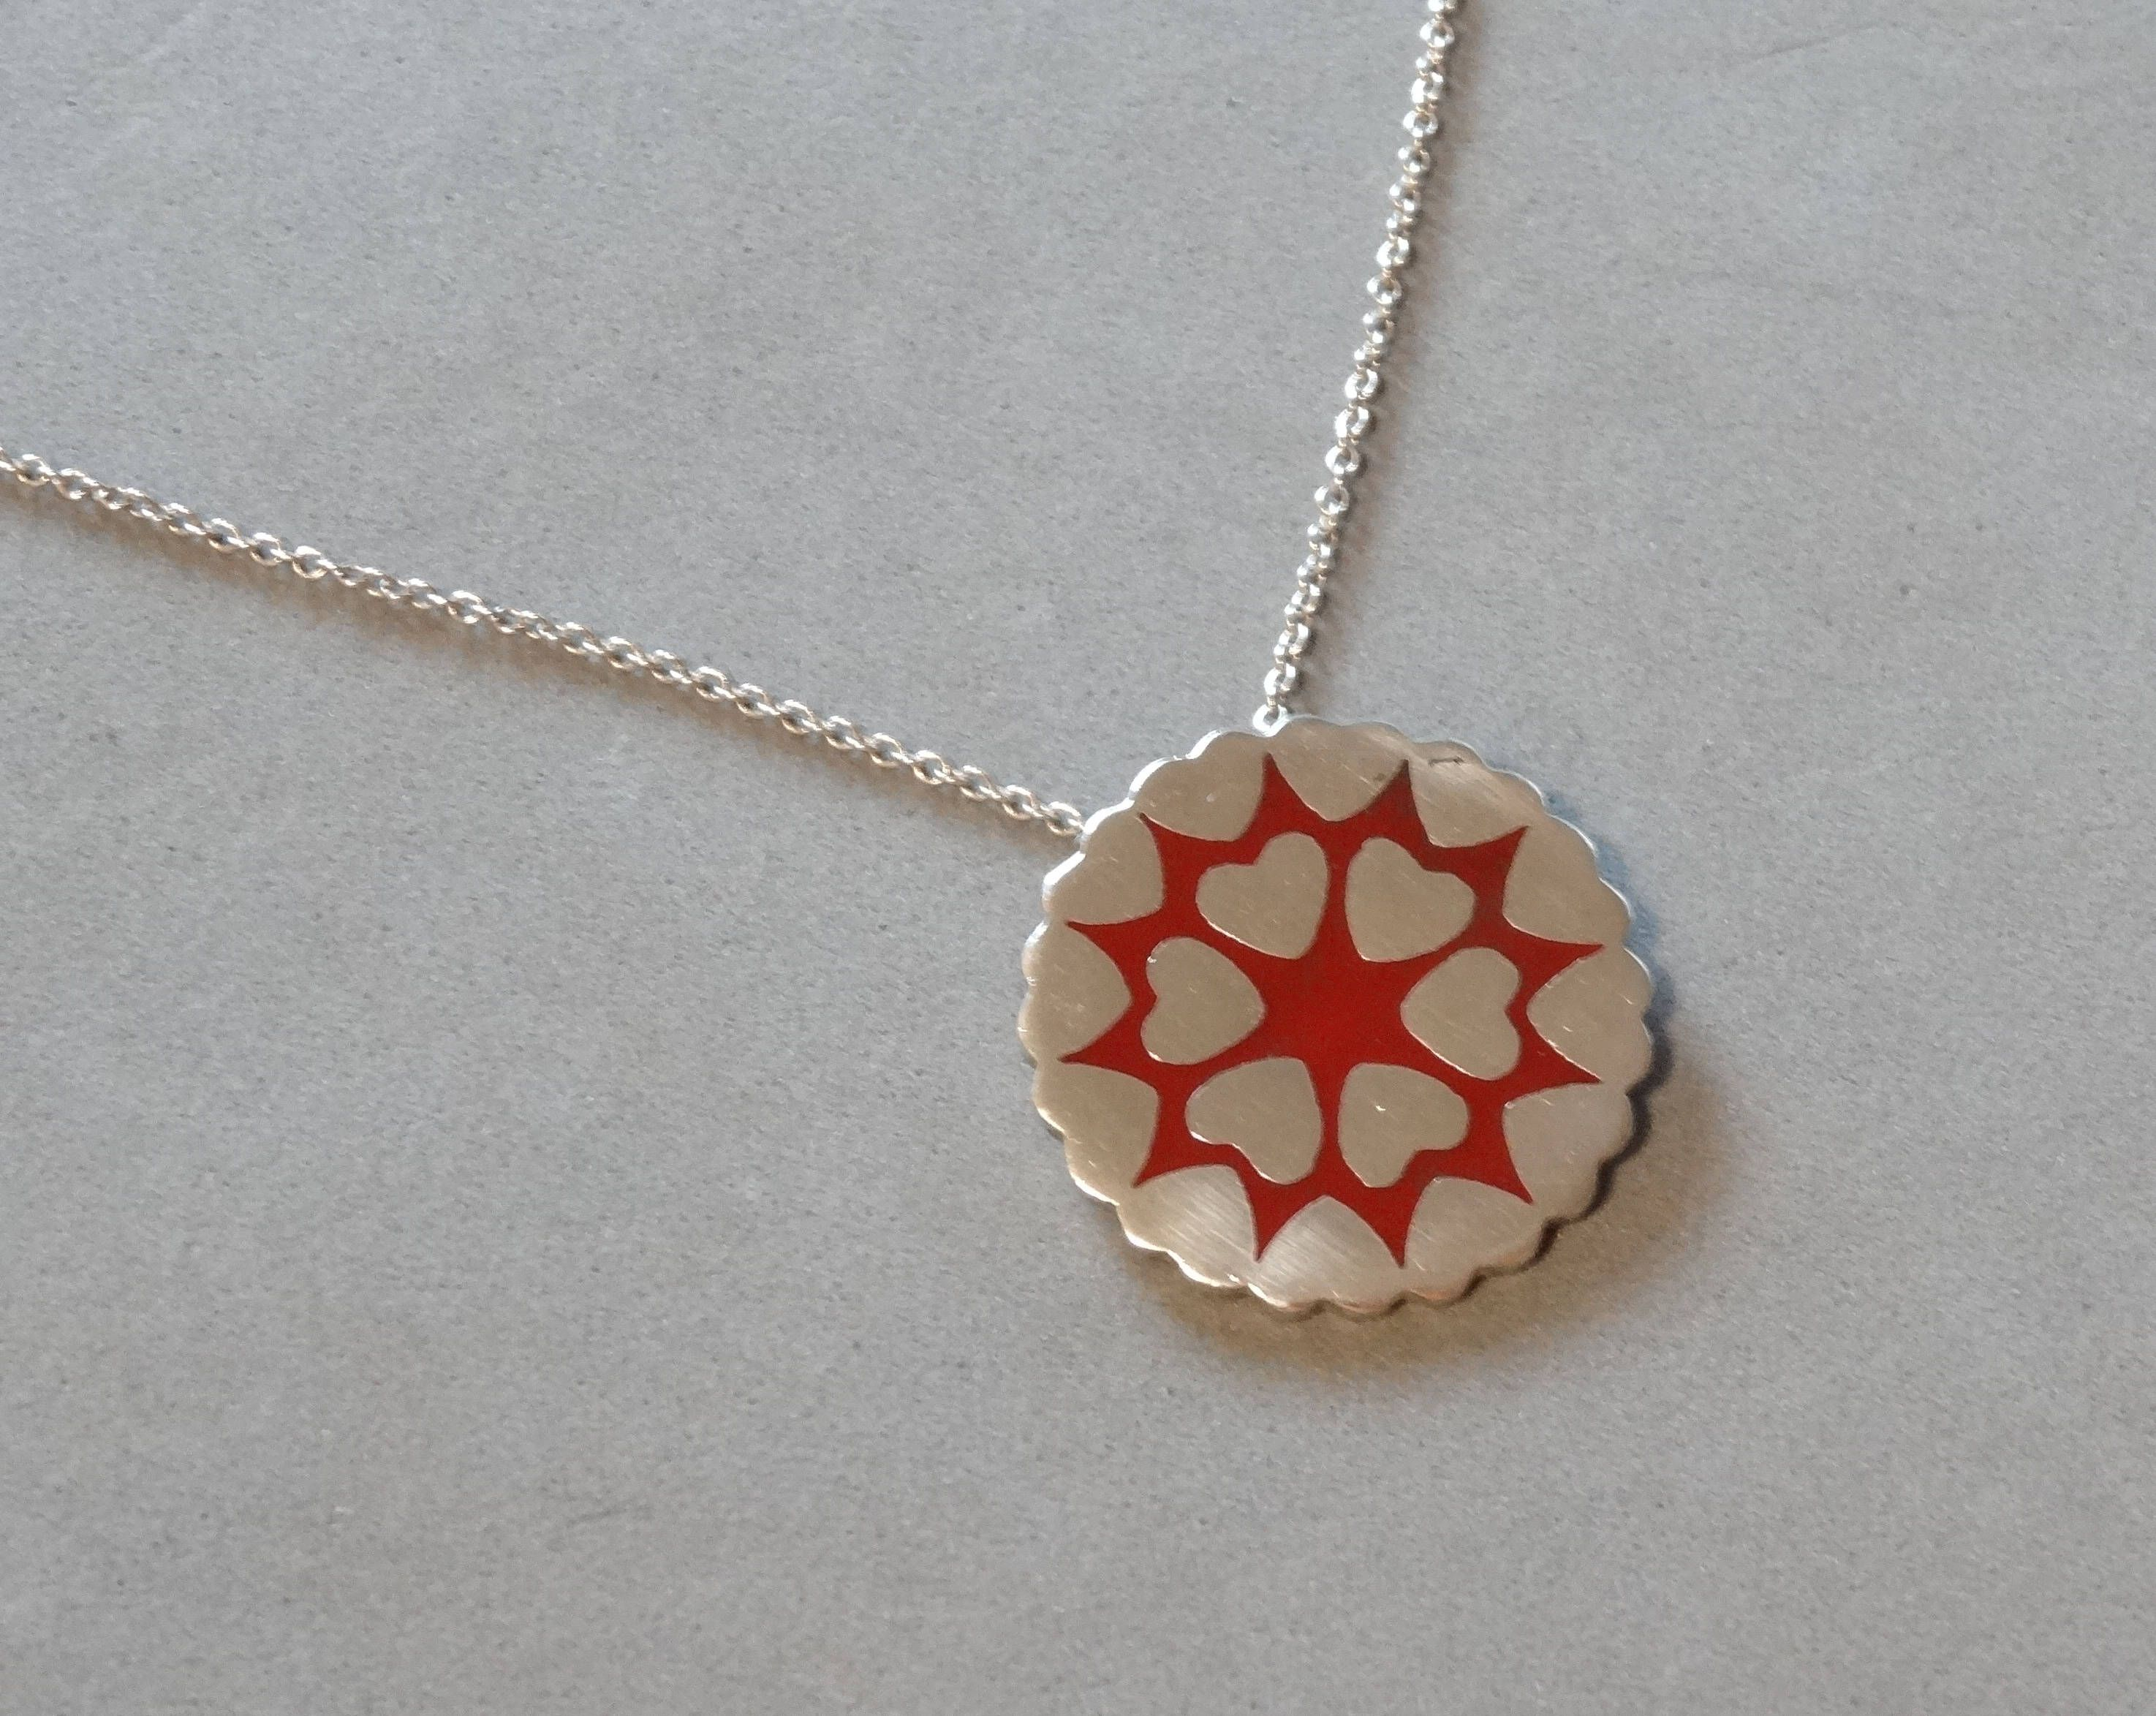 Vintage Heart Necklace Sterling Silver Pendant Red Enamel Gift for